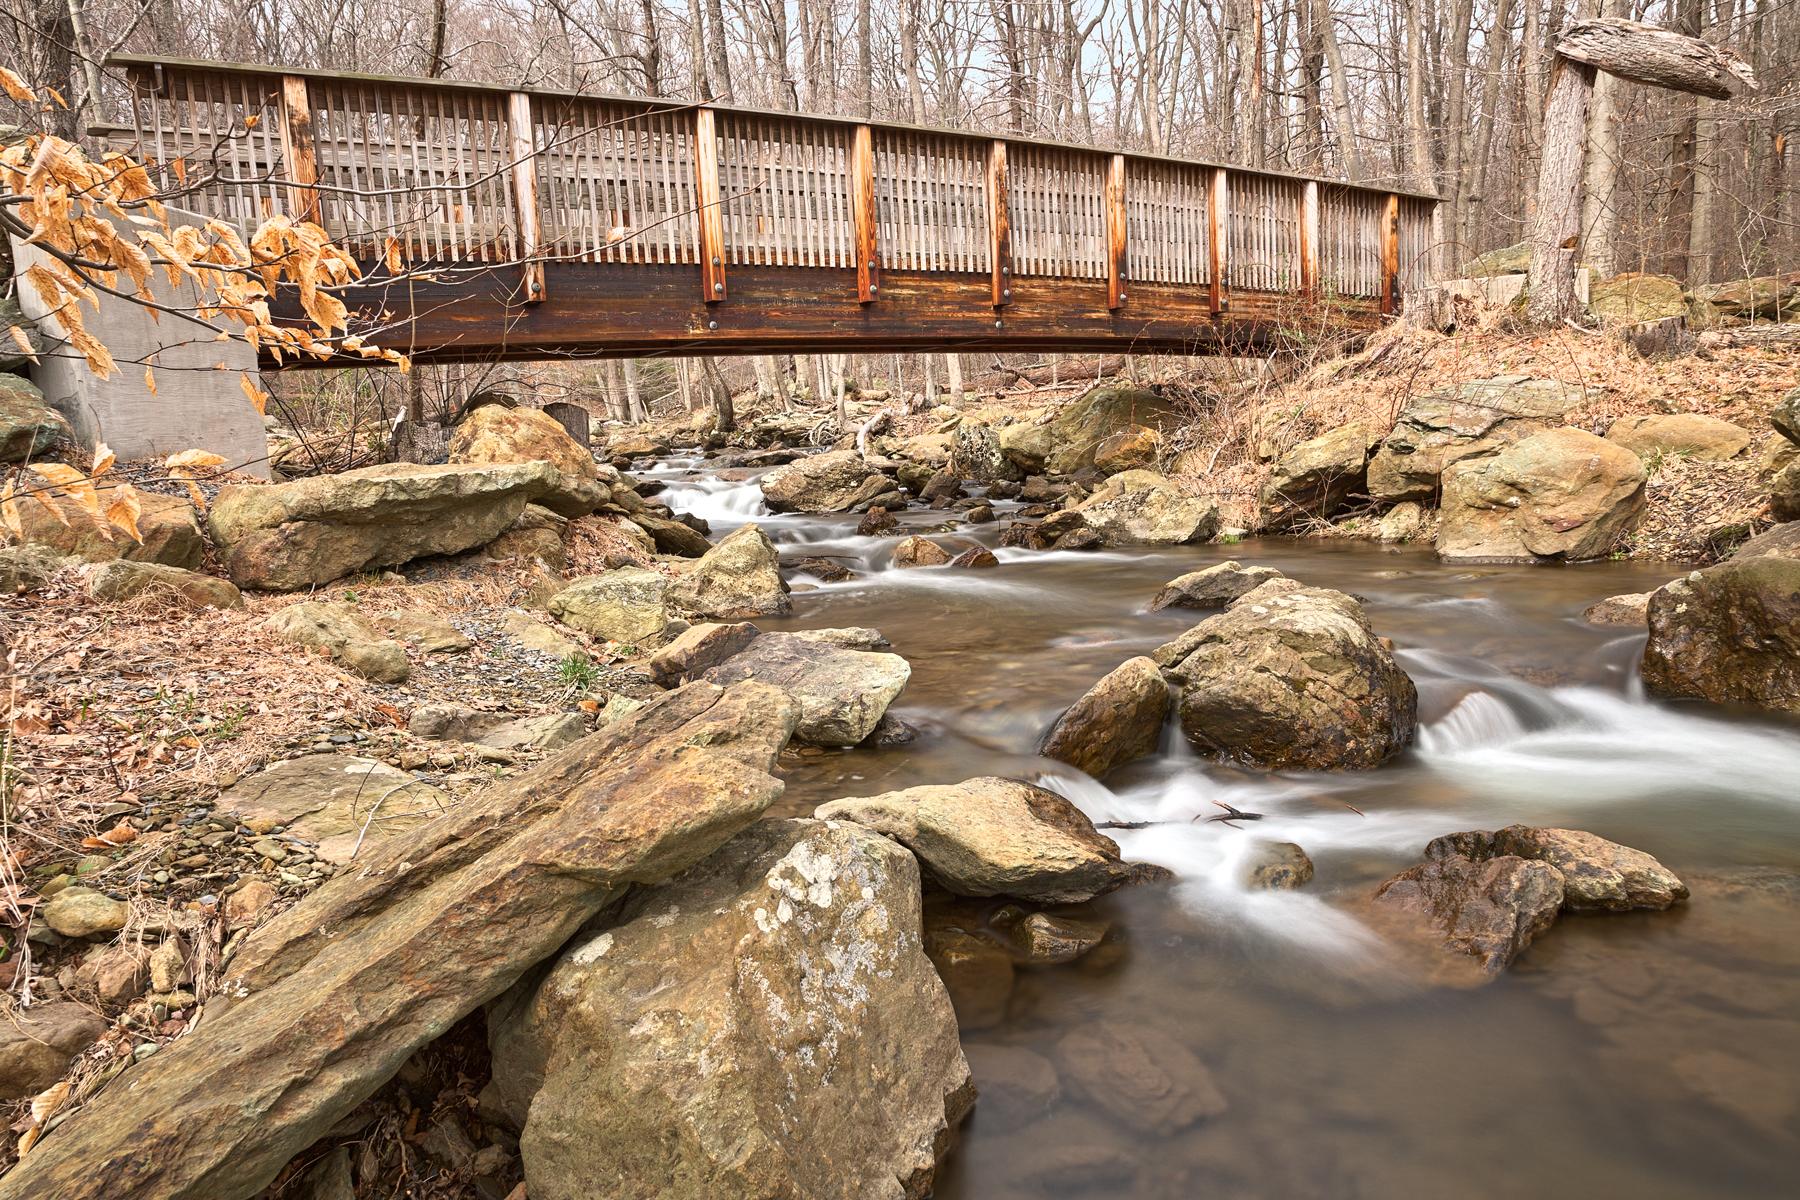 Cunningham forest bridge & stream - hdr photo